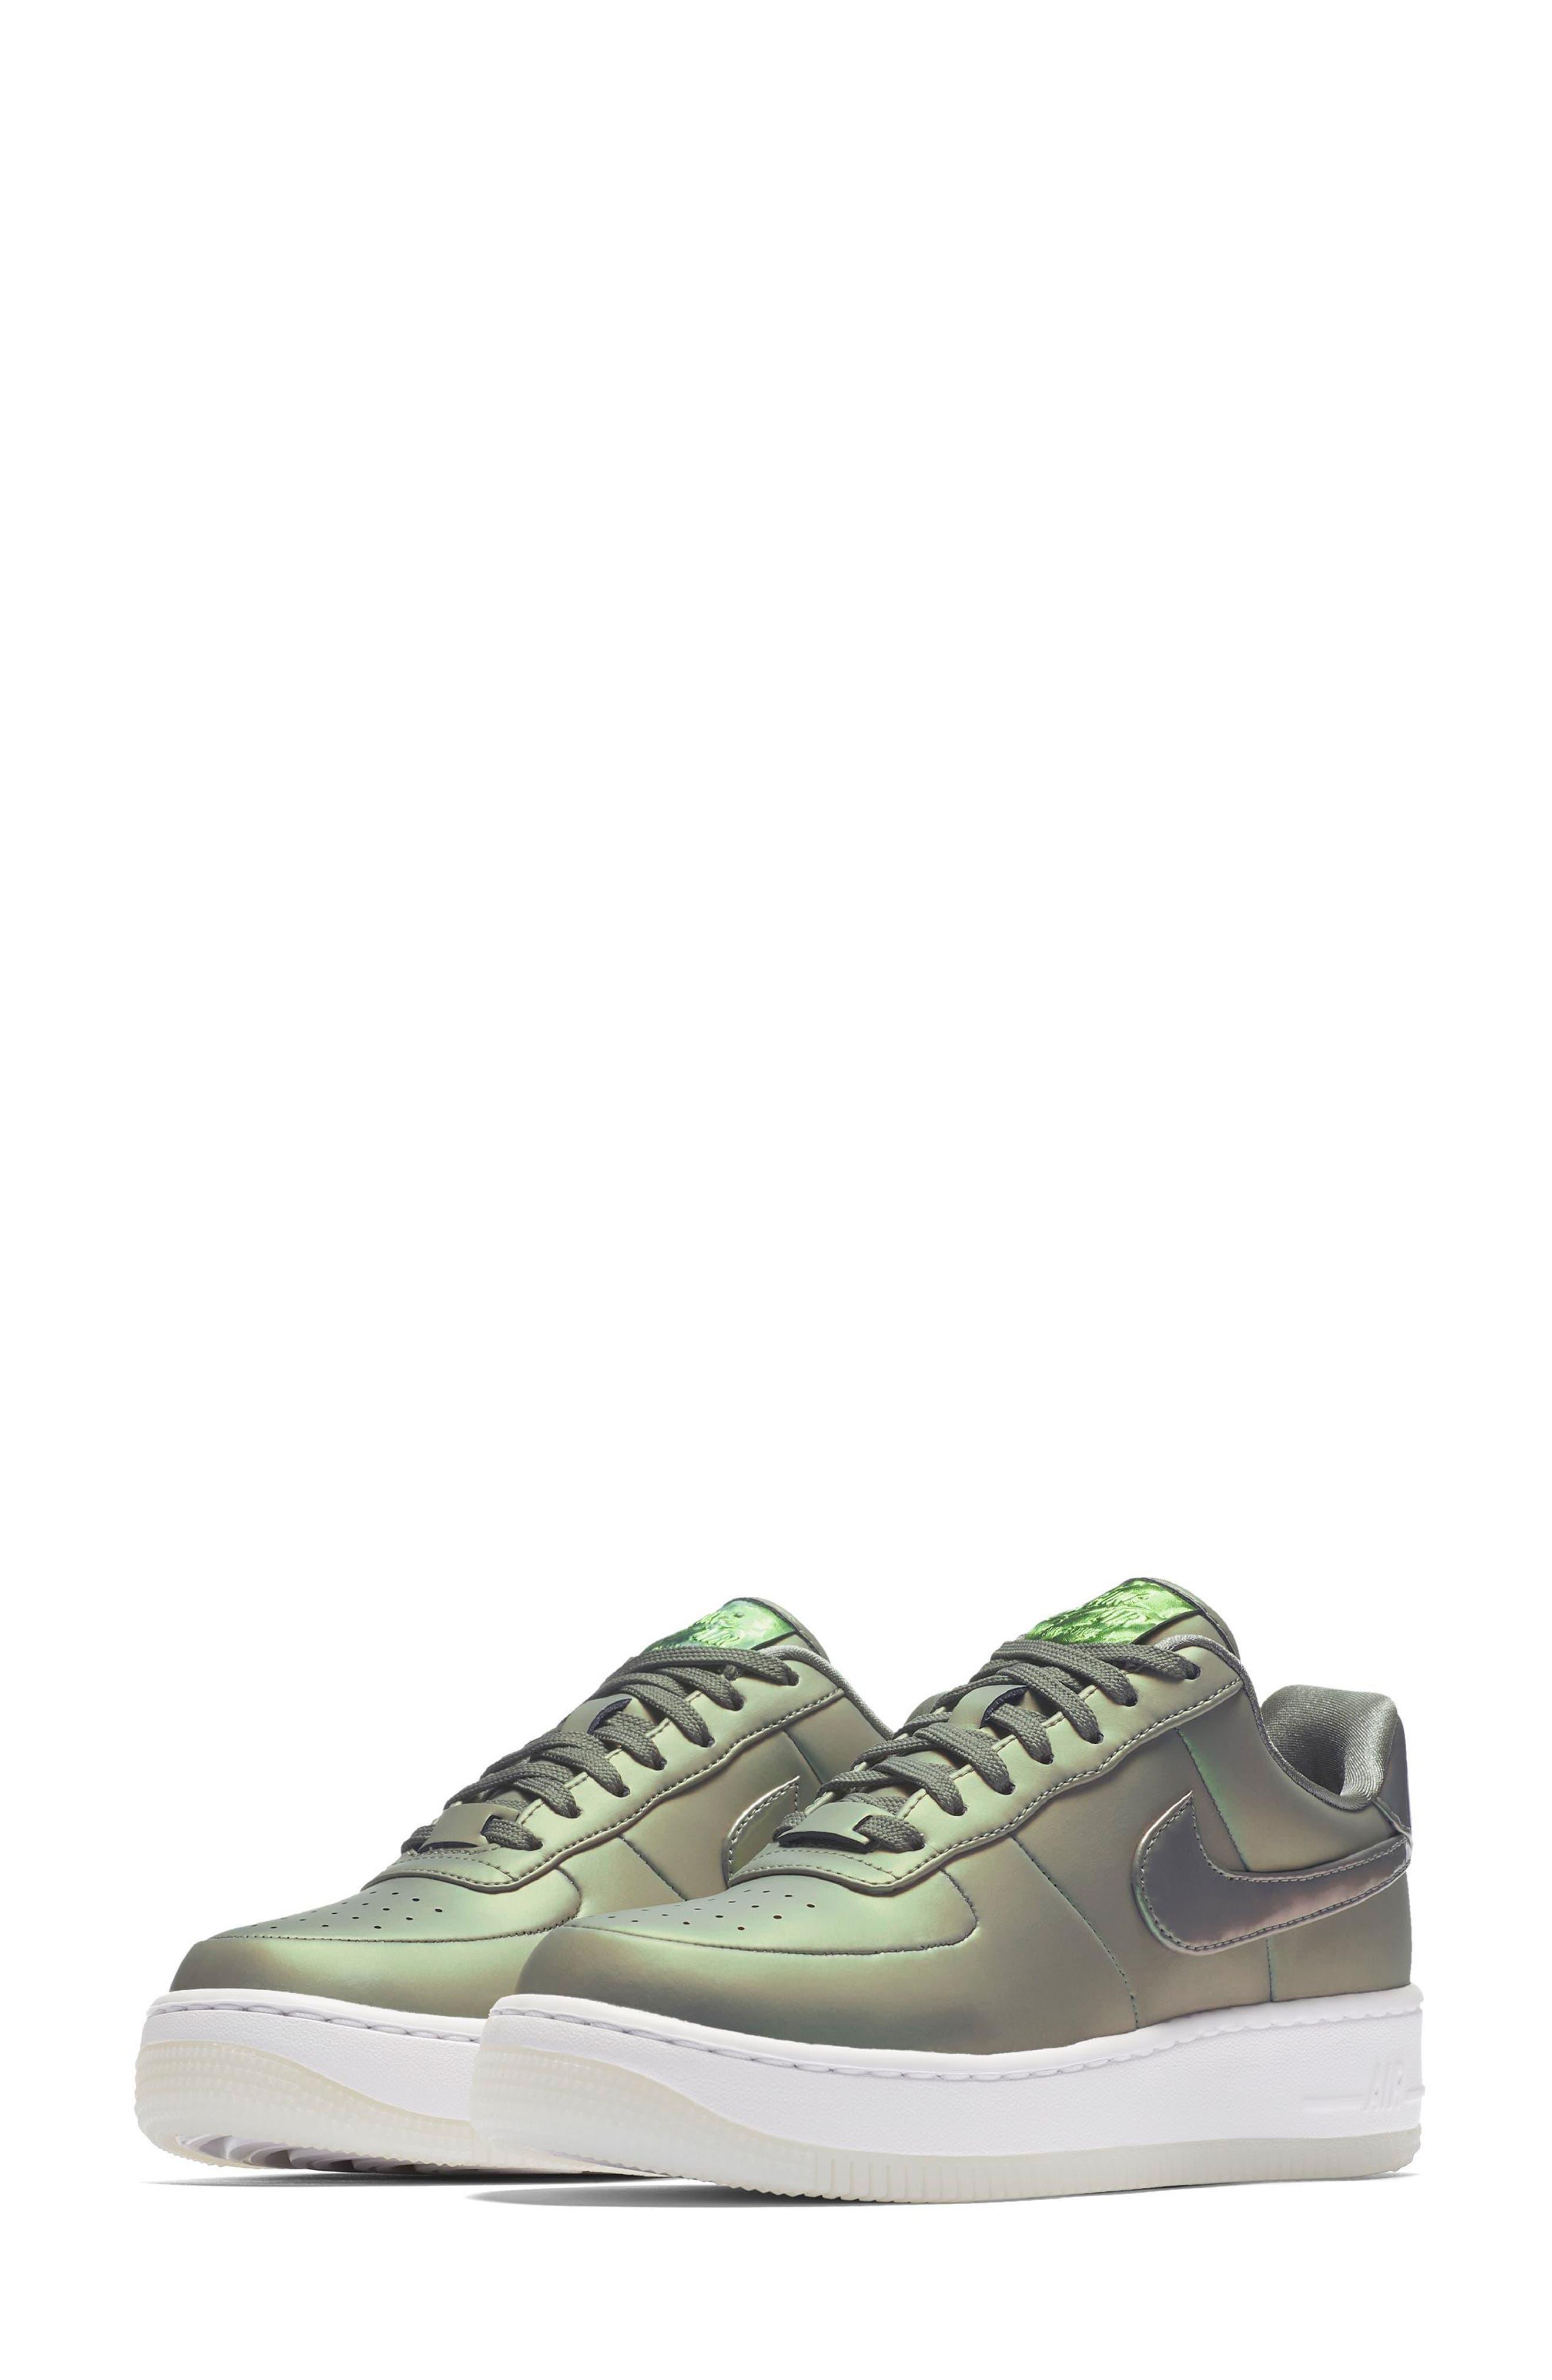 Air Force 1 Upstep Premium LX Shoe,                         Main,                         color, Dark Stucco/ Stucco/ White